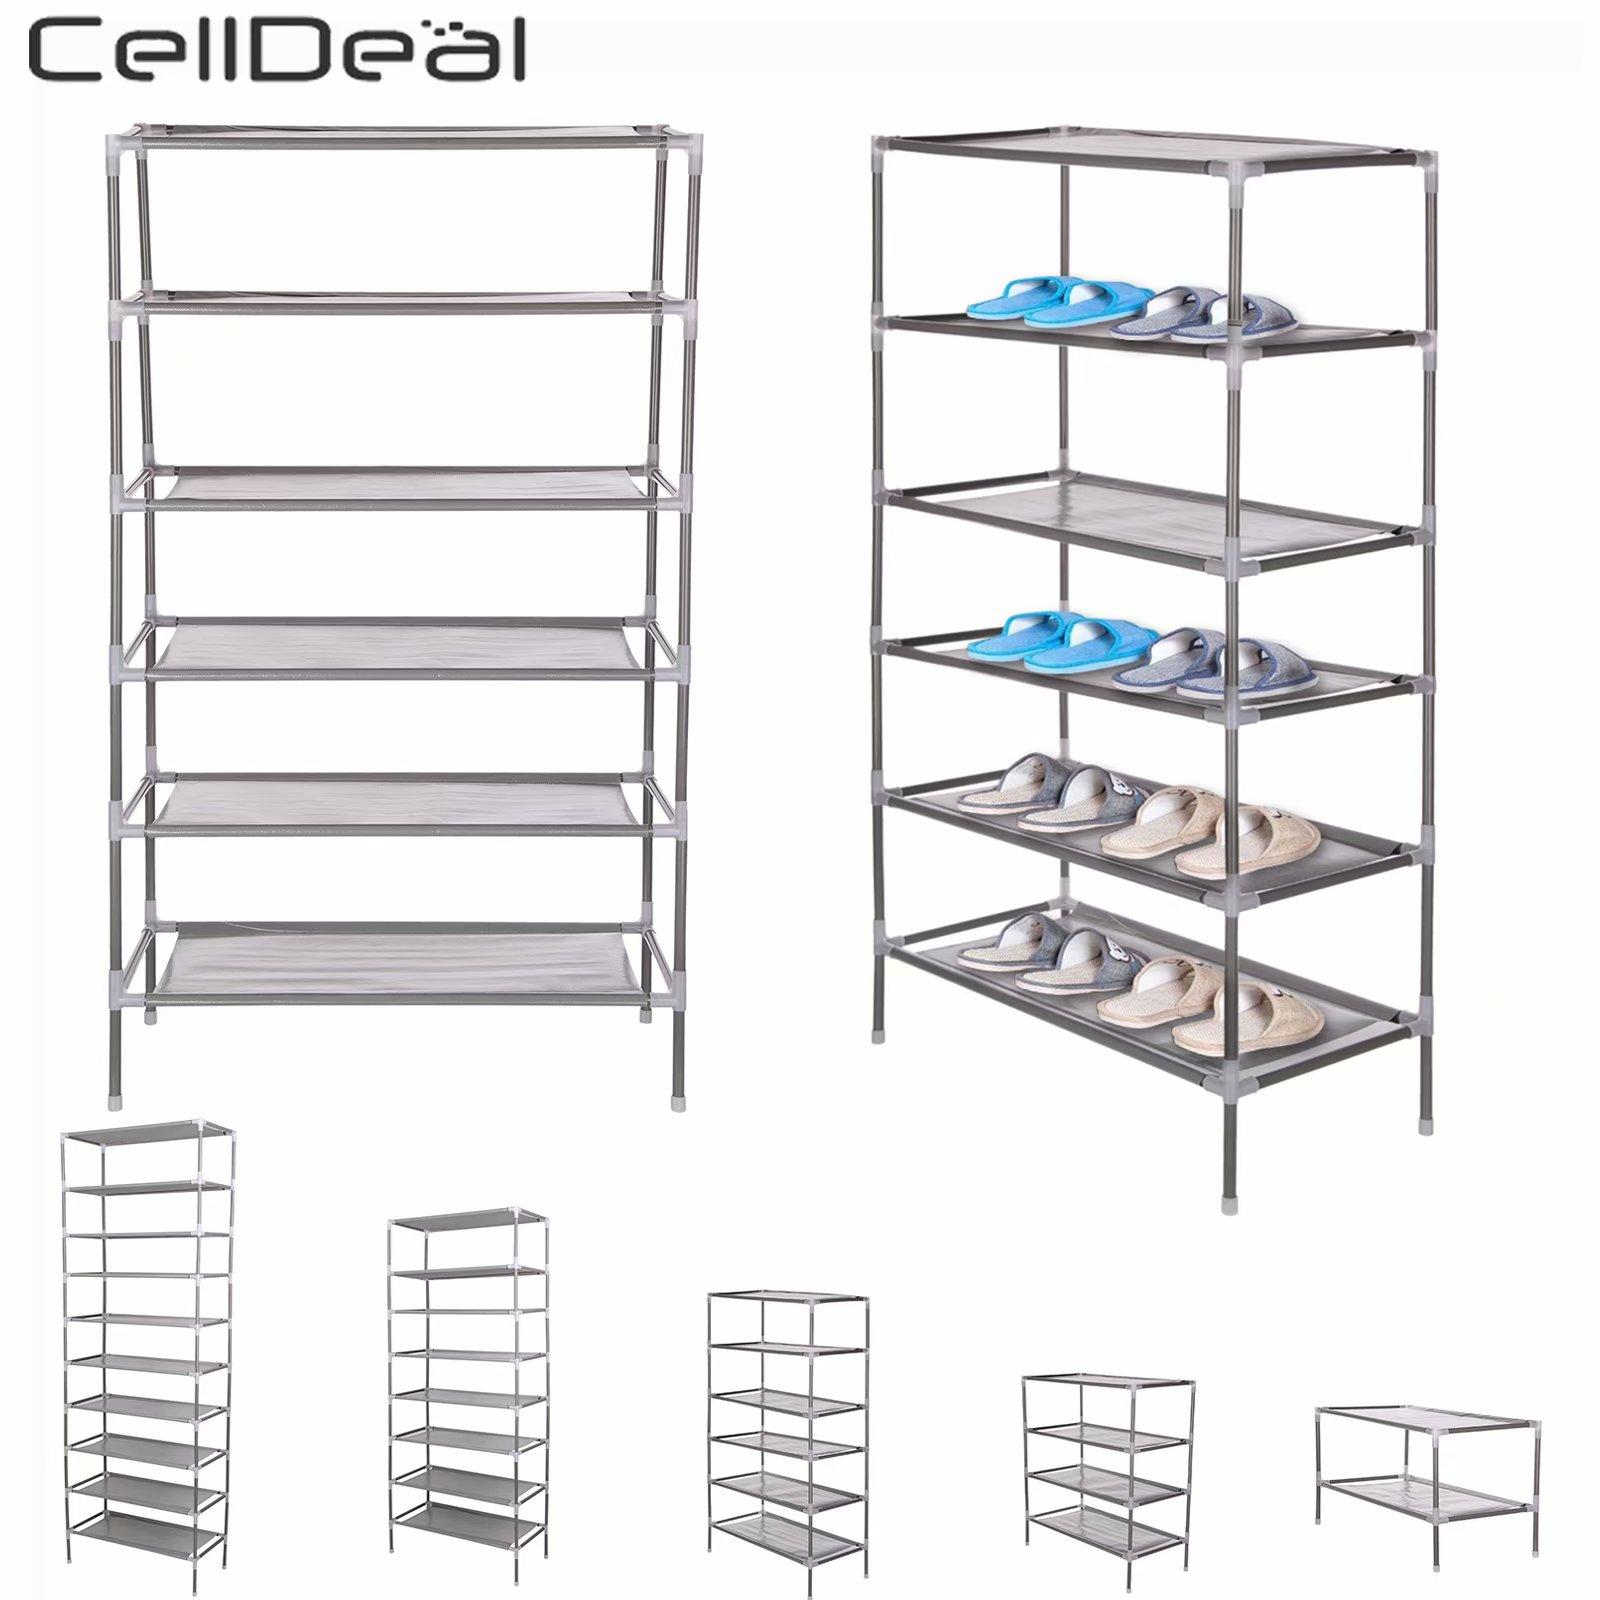 2/4/6-/.. Shelf Cover Shoe-Rack Storage-Organizer Cabinet Tiers Non-Woven-Fabric Celldeal